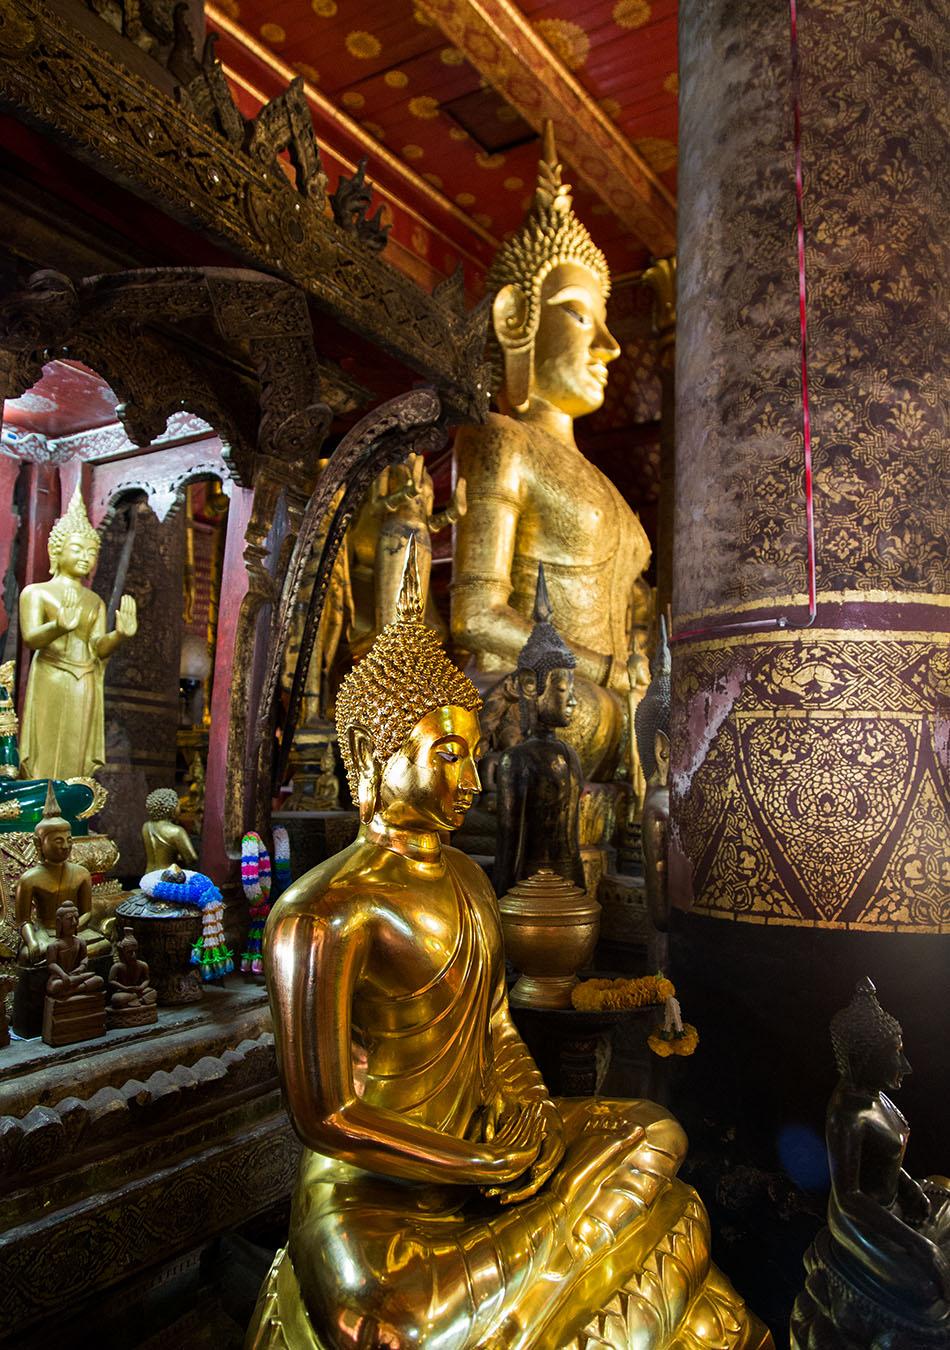 Fabian Fröhlich, Luang Prabang, Wat Mai Suwannaphumaham, Buddha statues